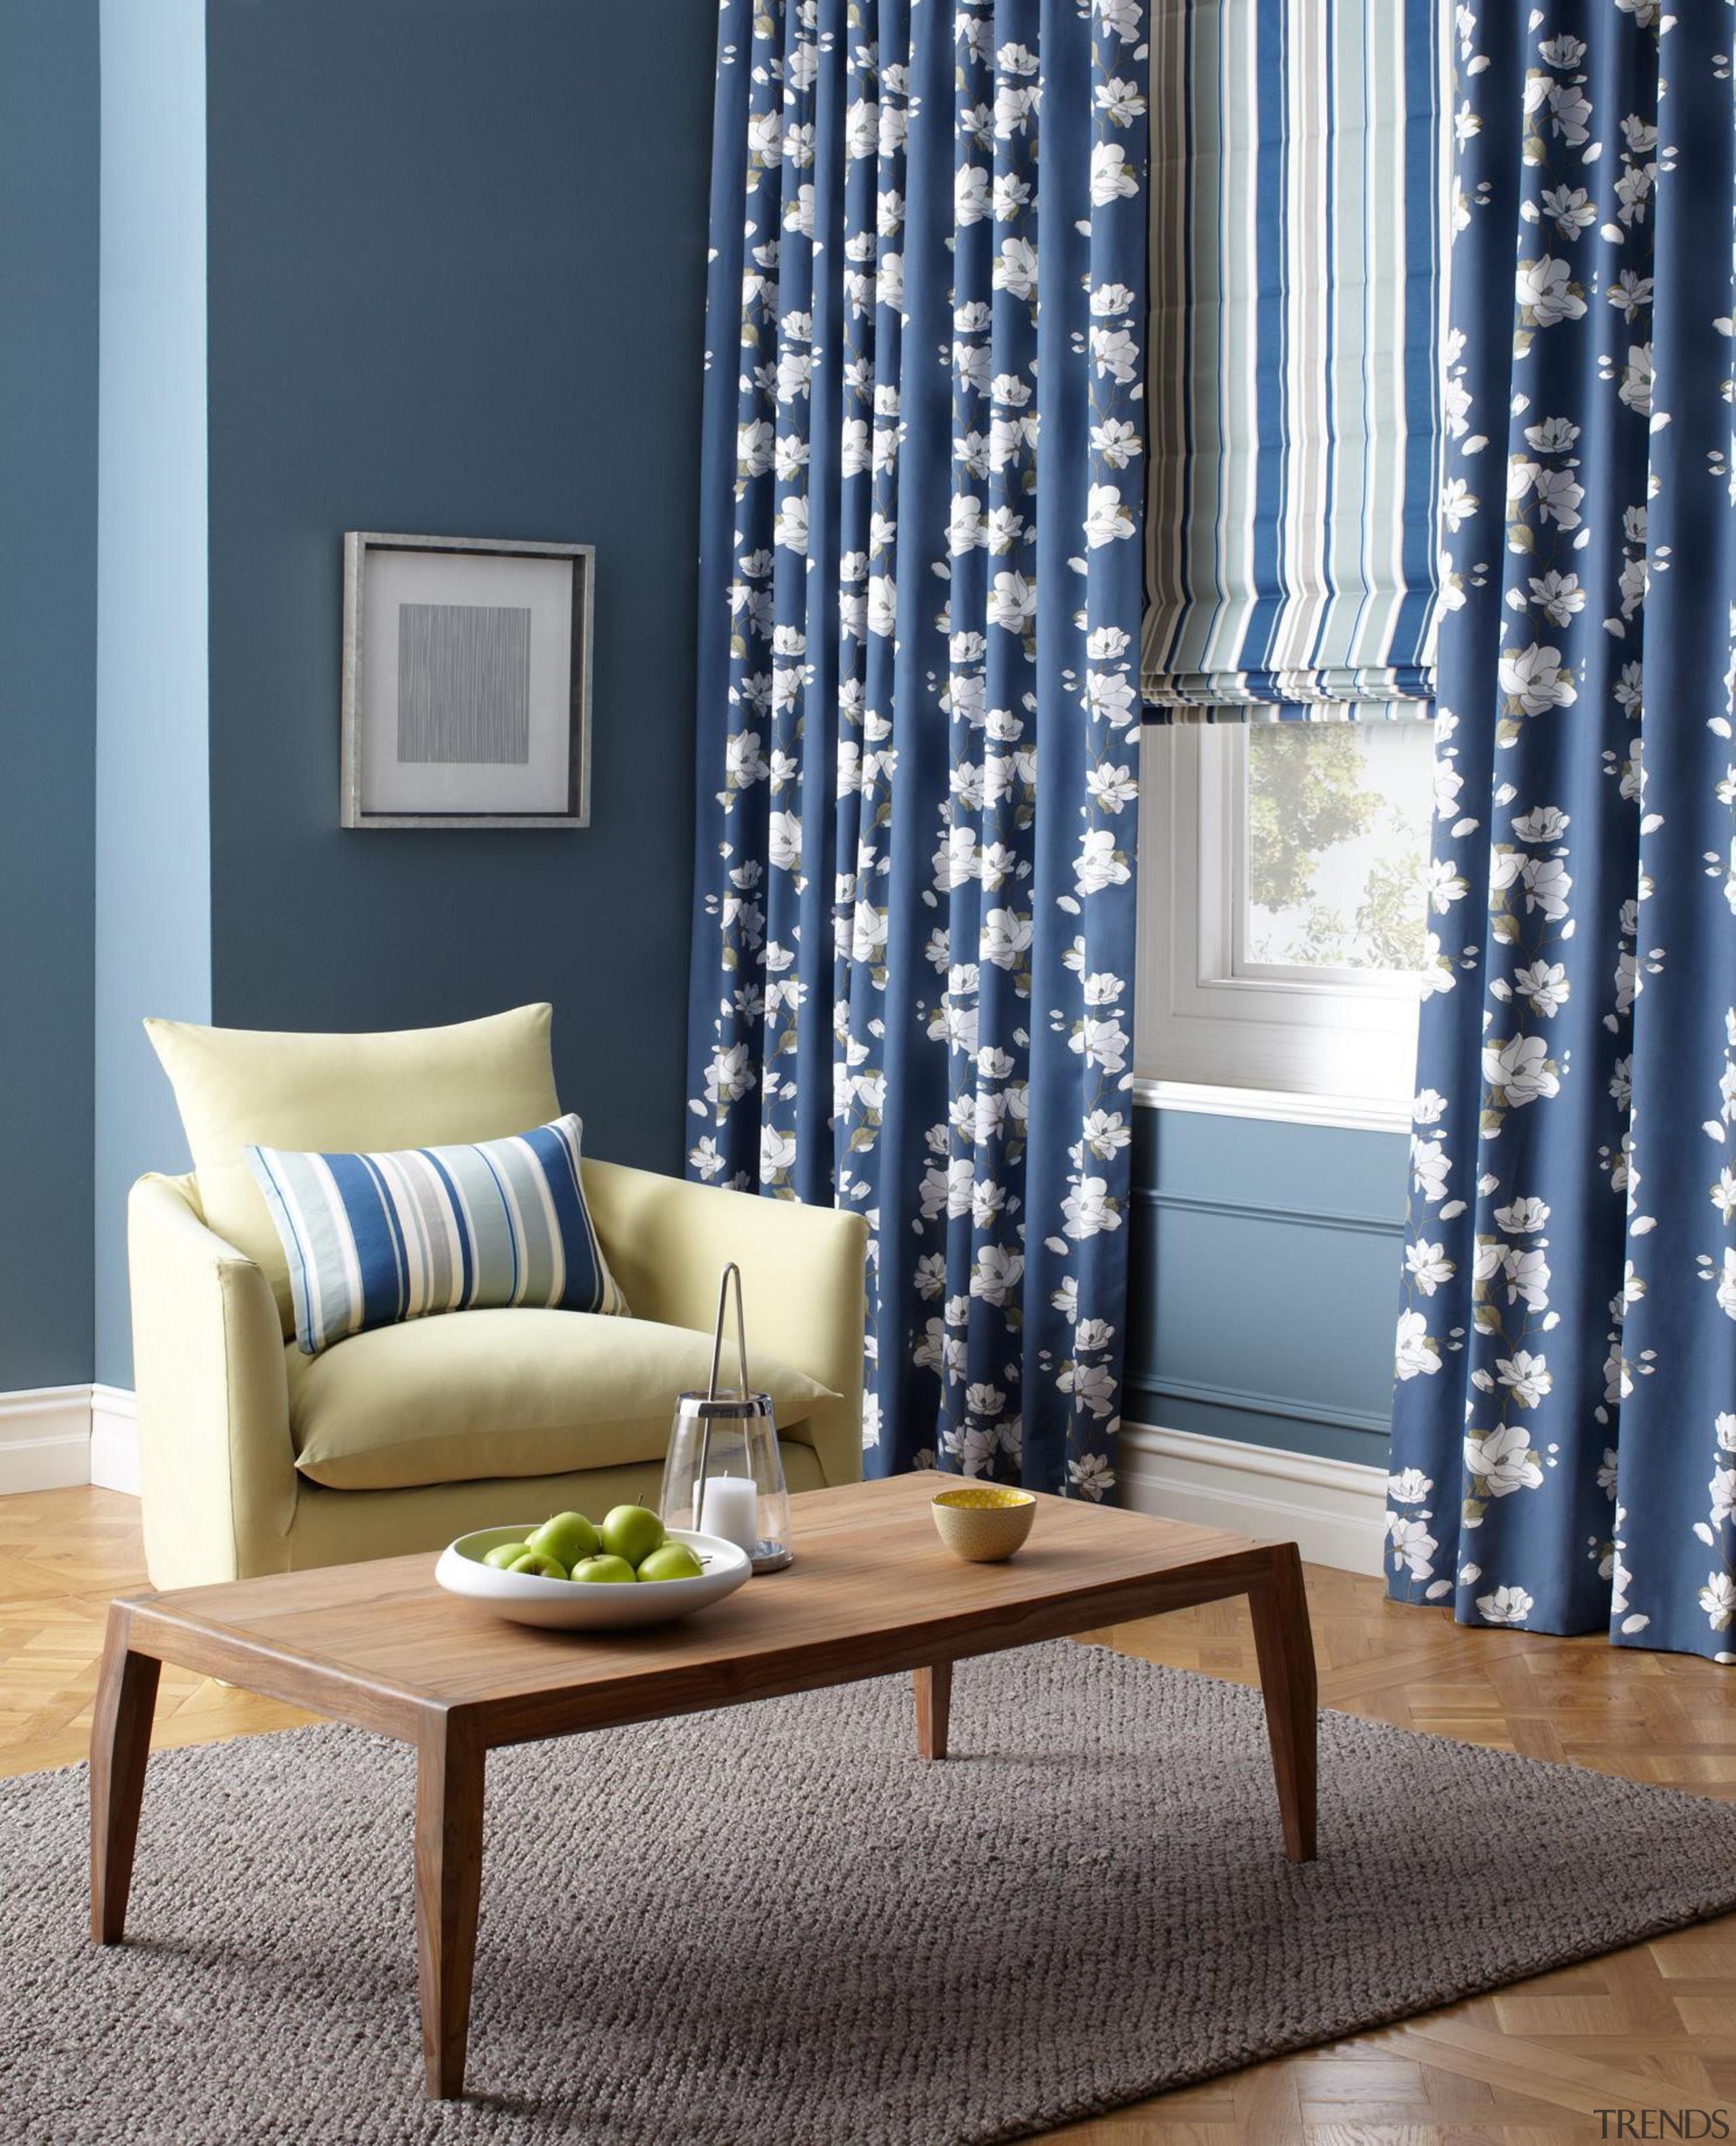 Grandiflora & Marbella - Grandiflora - blue | blue, couch, curtain, decor, home, interior design, living room, table, textile, window, window blind, window covering, window treatment, gray